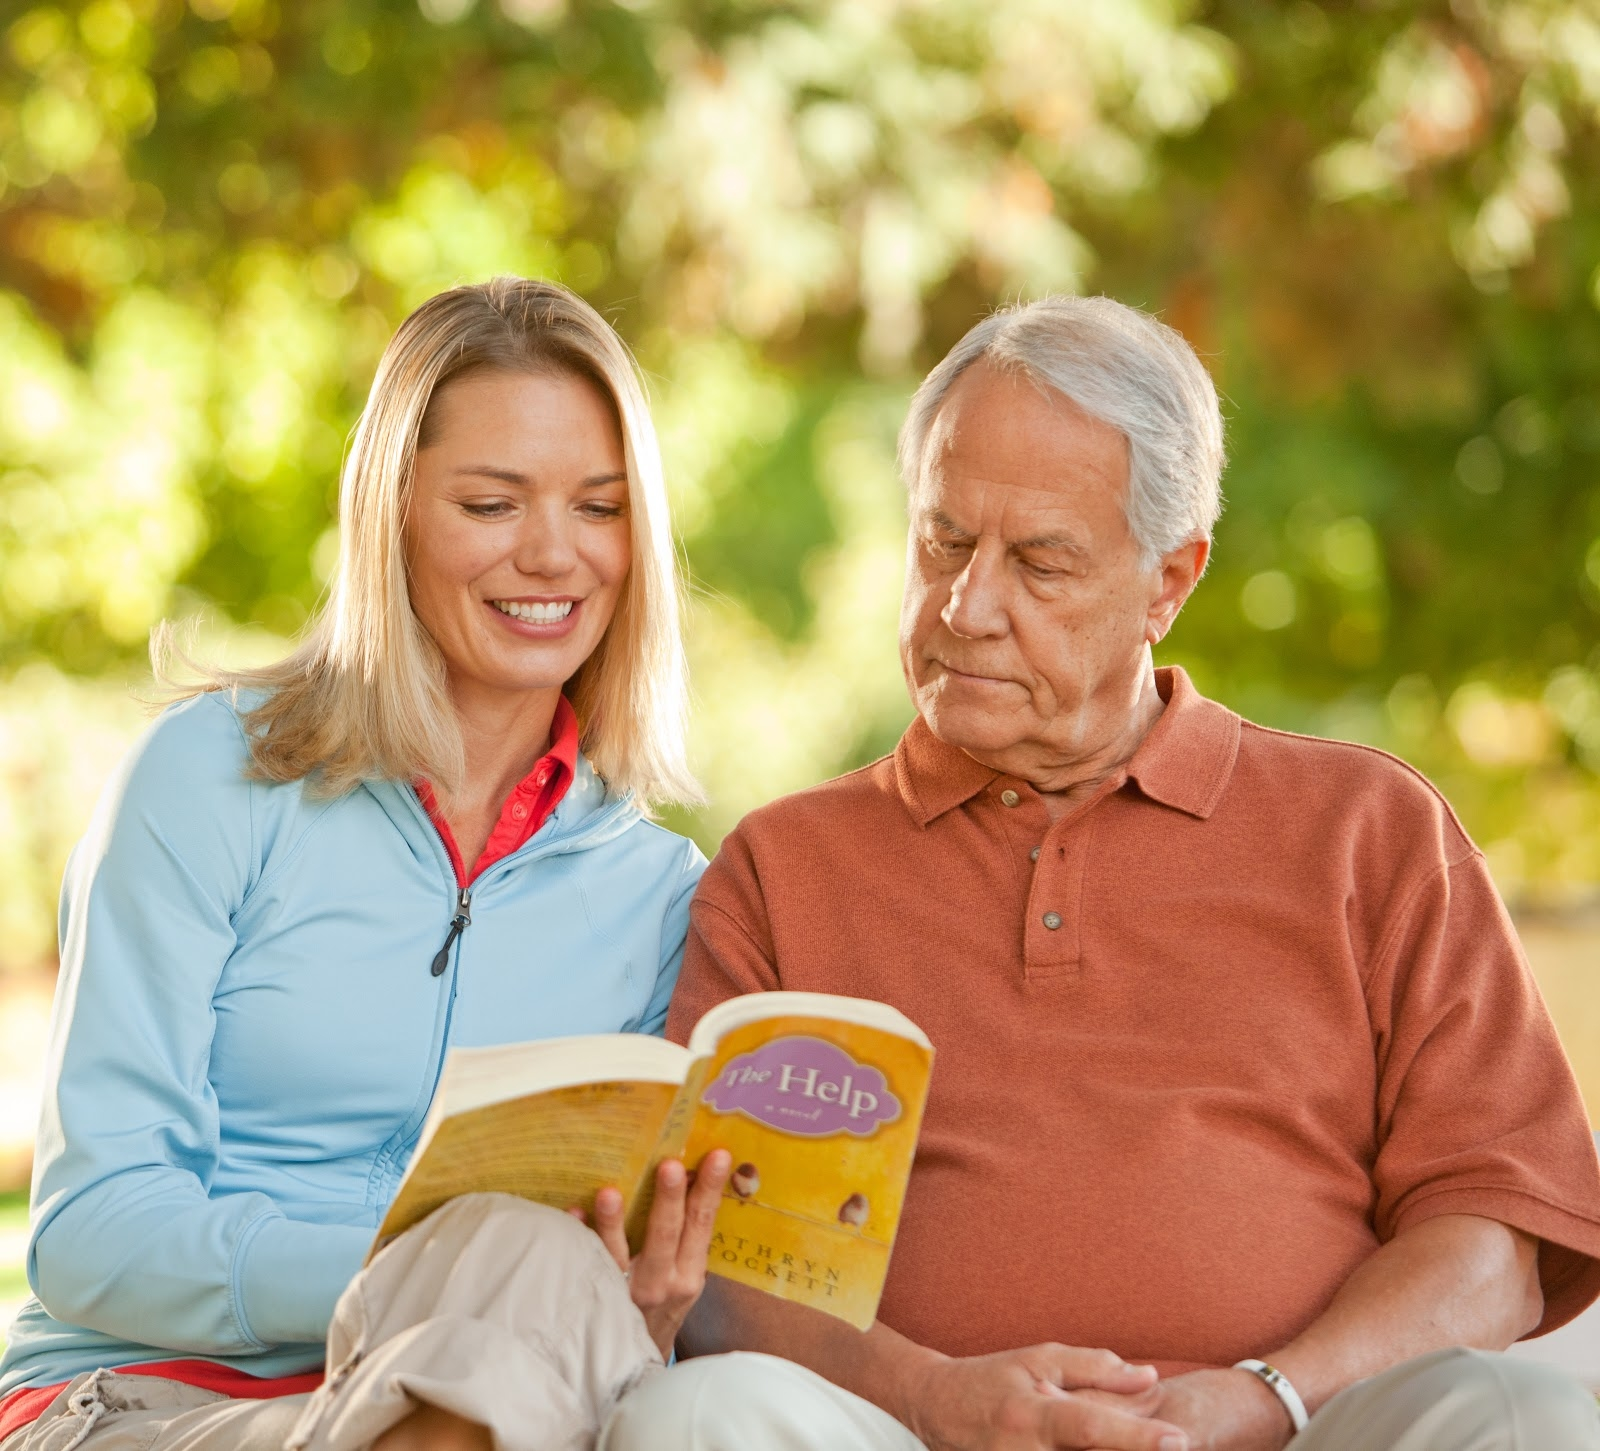 mishawaka senior personals Loveawakecom is free mishawaka older women online dating site we offer the totally free matchmaking service for retired mature men and women in mishawaka.